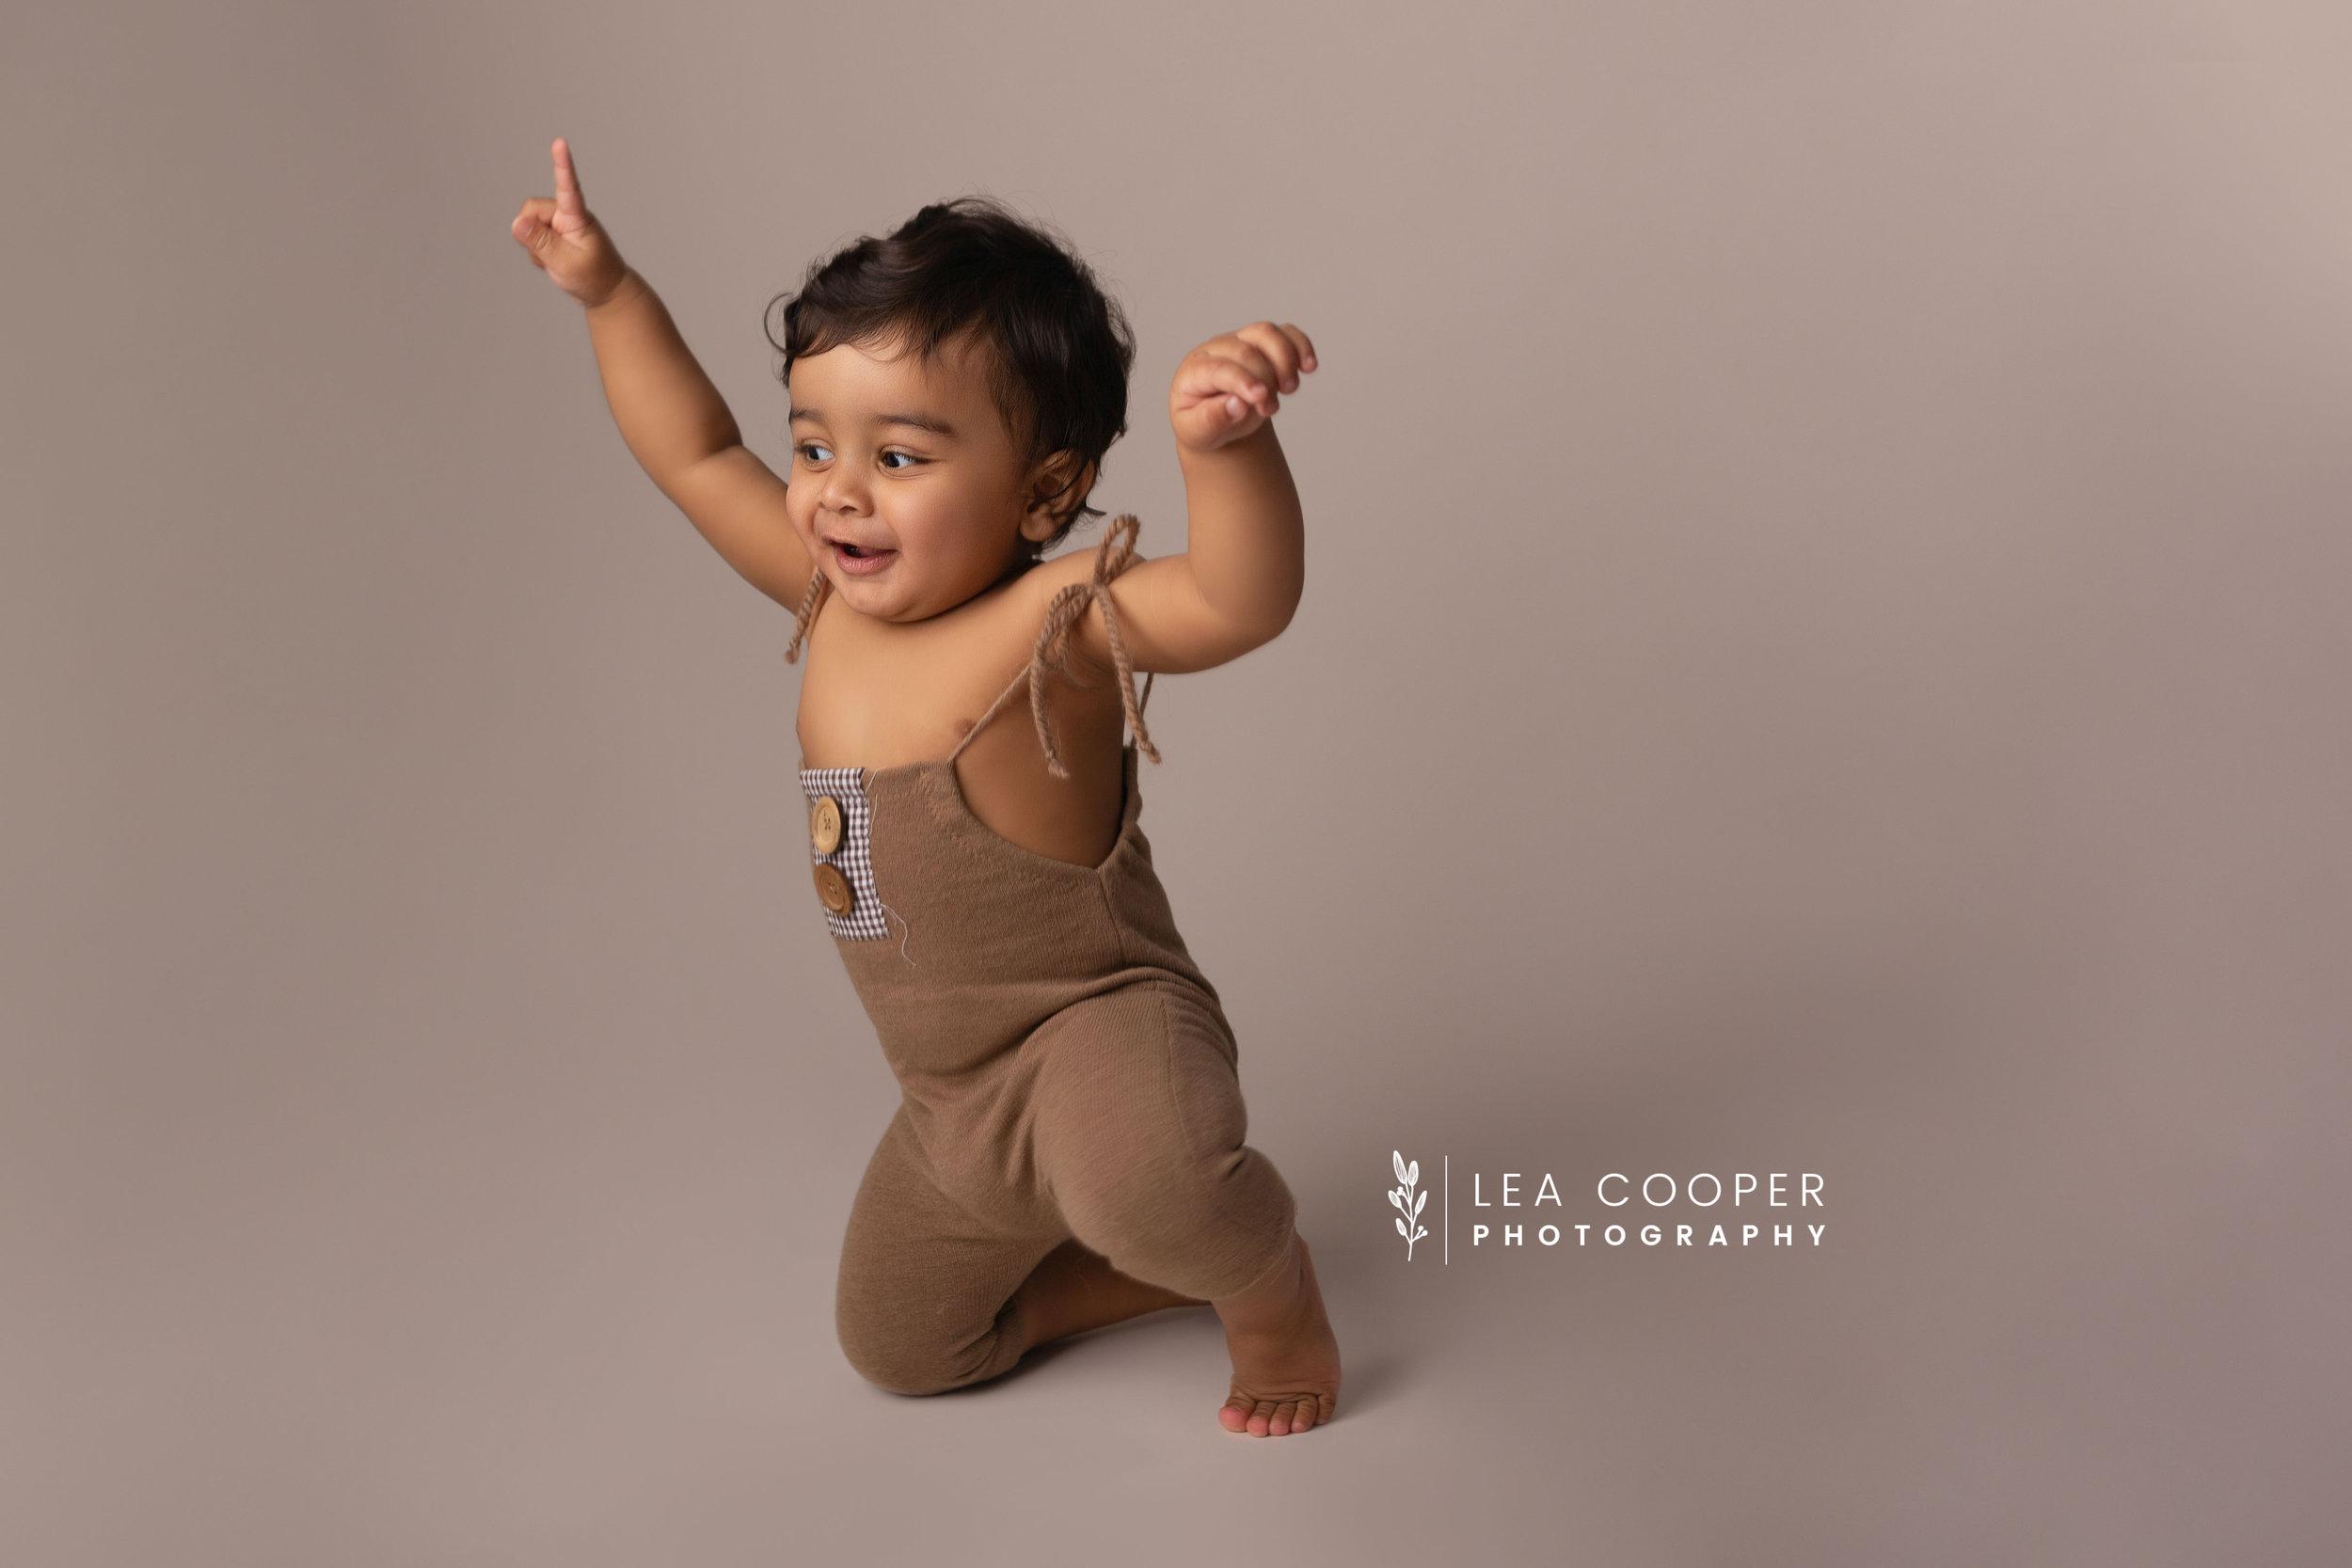 LEA-COOPER-PHOTOGRAPHY-CAKE-SMASH-PHOTOGRAPHER-WILLENALL-WOLVERHAMPTON-CHILD-PHOTOSHOOT-1ST—BIRTHDAY-PICTURES-WEDNESBURY-WALSALL-DUDLEY-WEST-MIDLANDS-UK-11.JPG